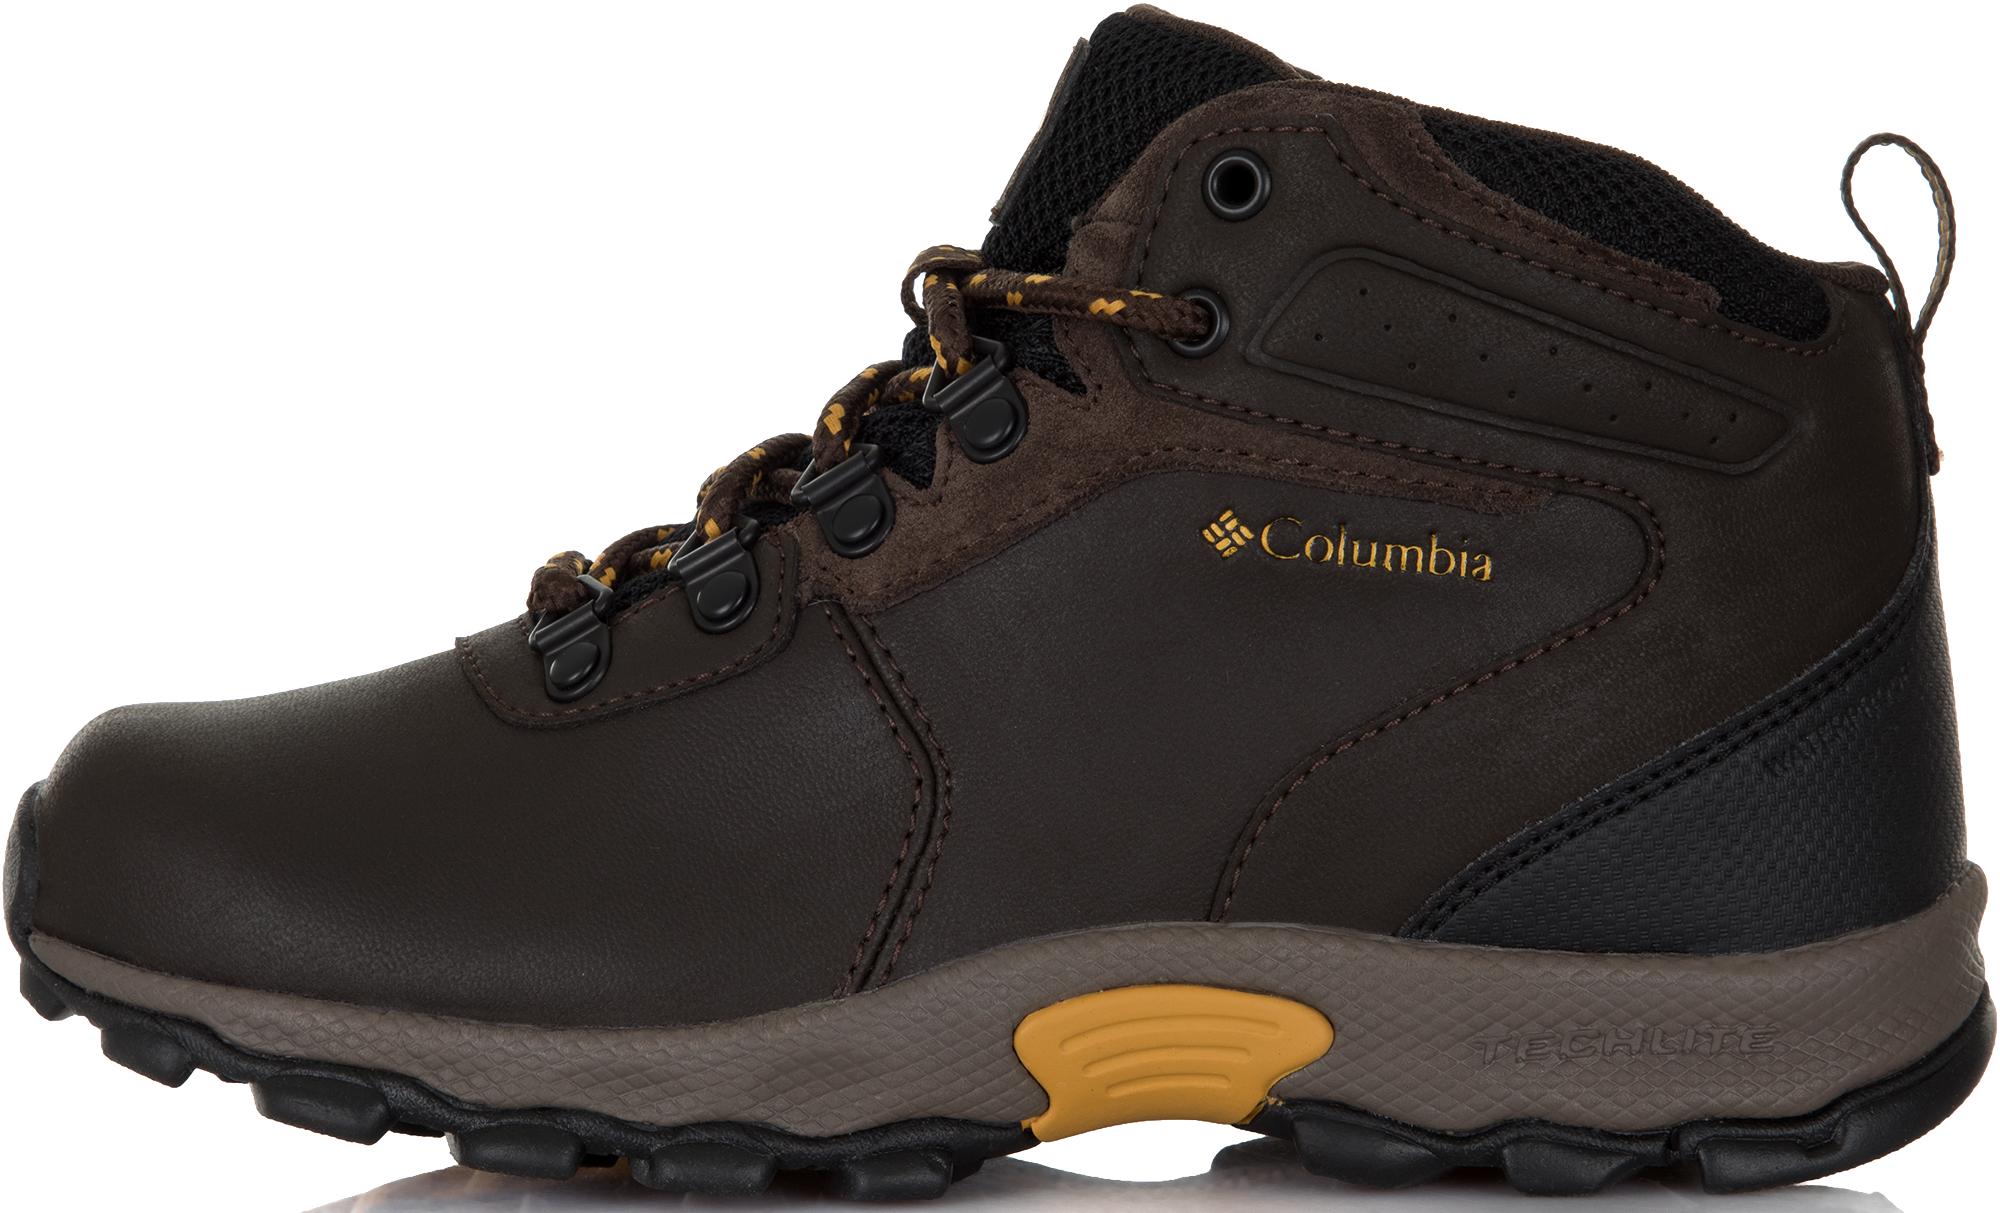 Columbia Ботинки для мальчиков Columbia Youth Newton Ridge, размер 31,5 ботинки мужские columbia newton ridge plus ii suede wp цвет зеленый 1746411 213 размер 9 42